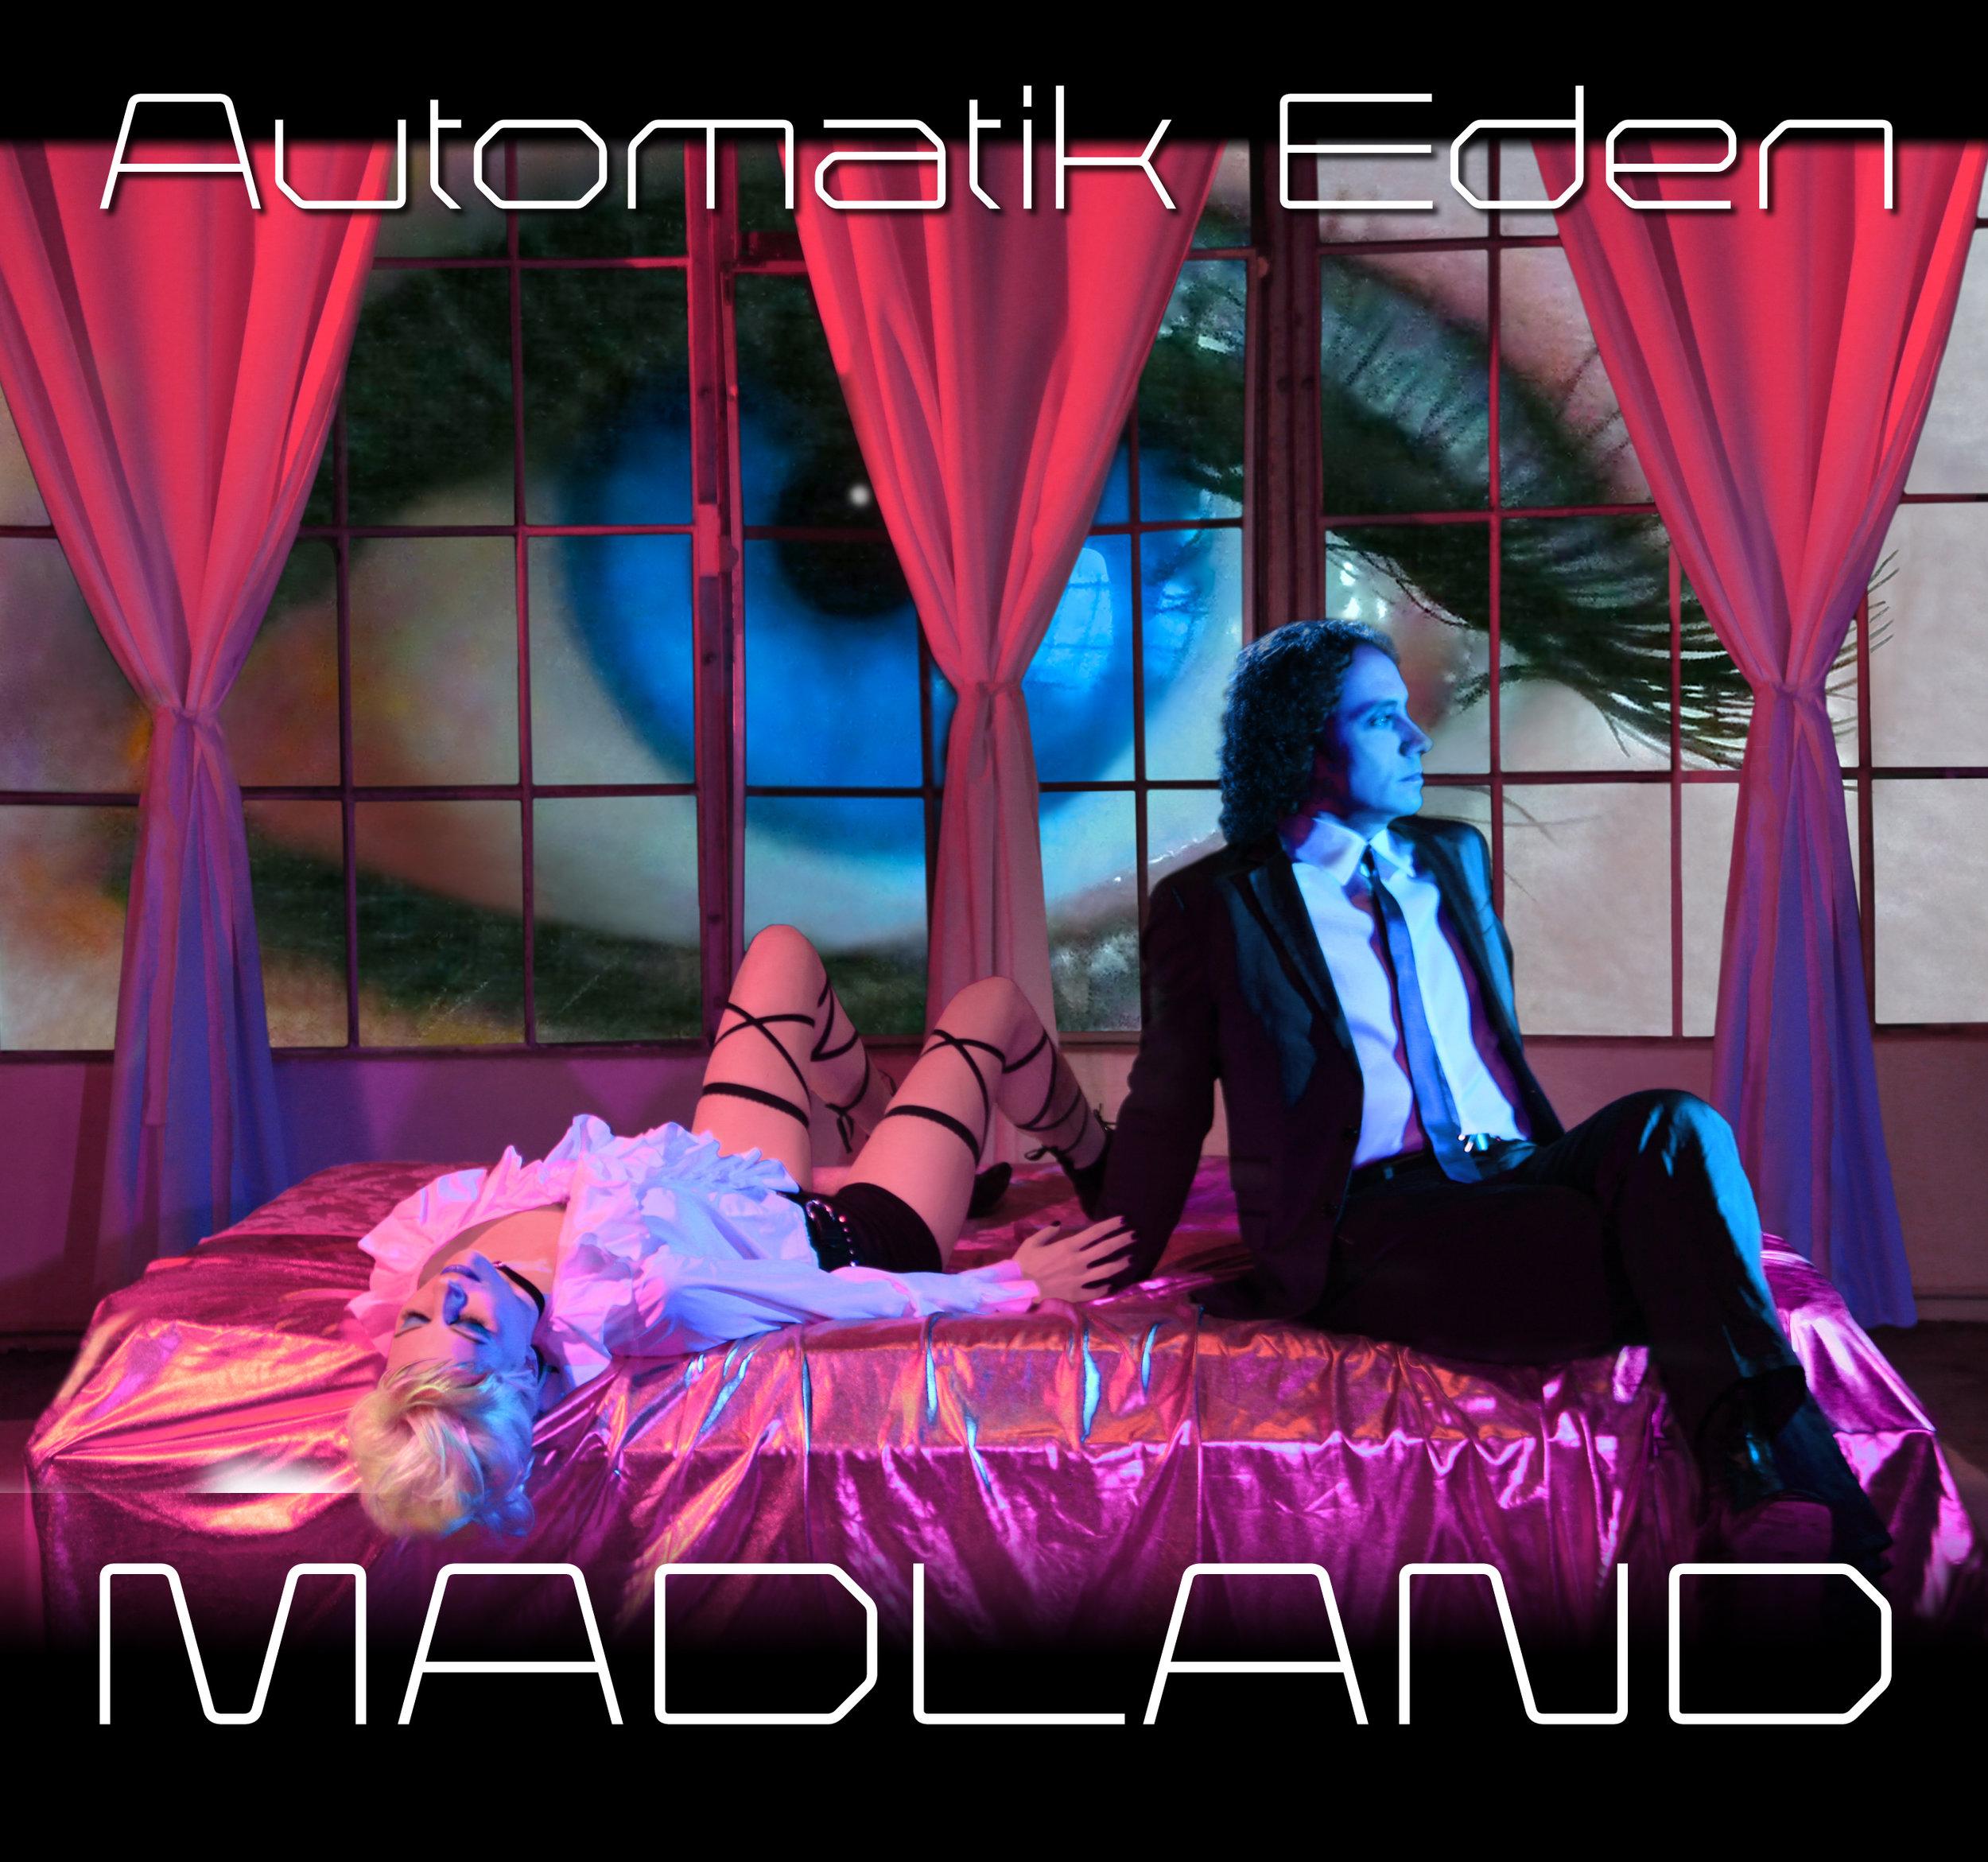 A-Eden-Madland-cover-promo.jpg